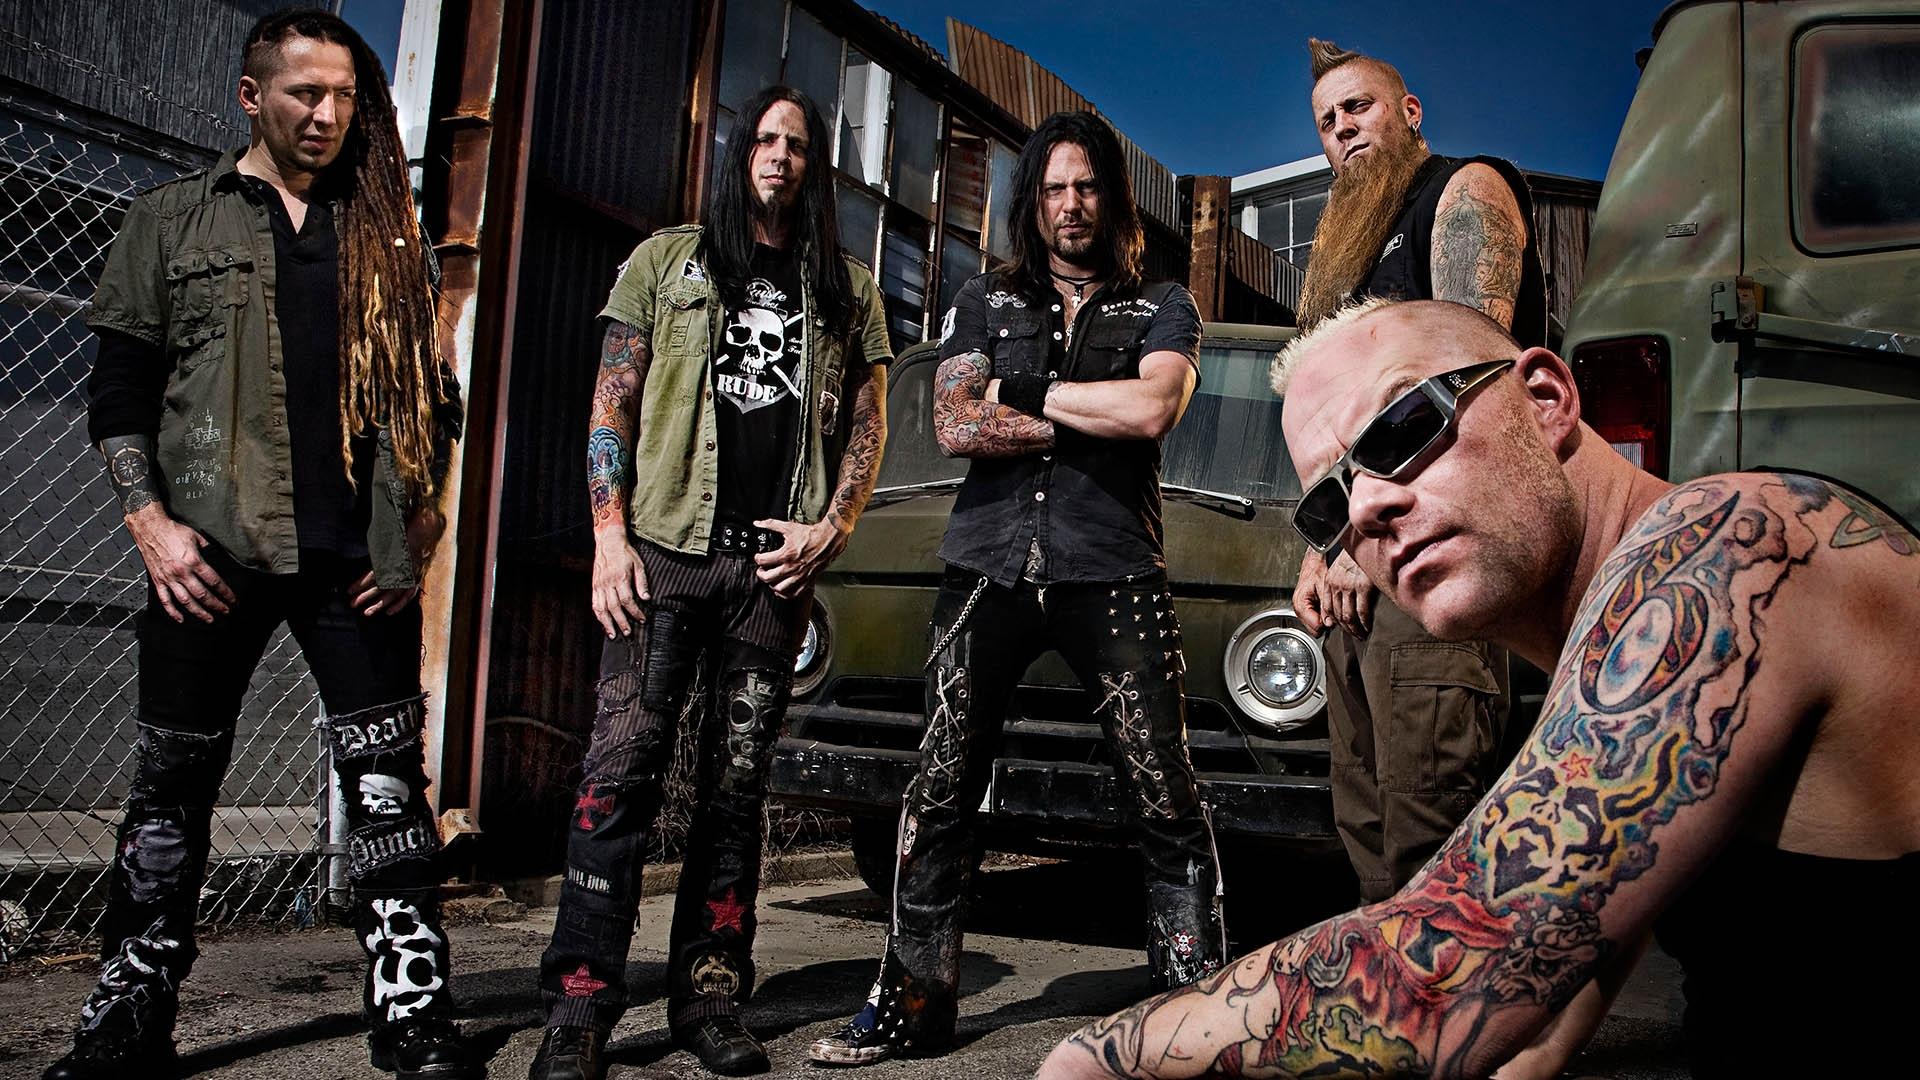 Tattoo Musician Dreadlocks Five Finger Death Punch Cars Print Gang